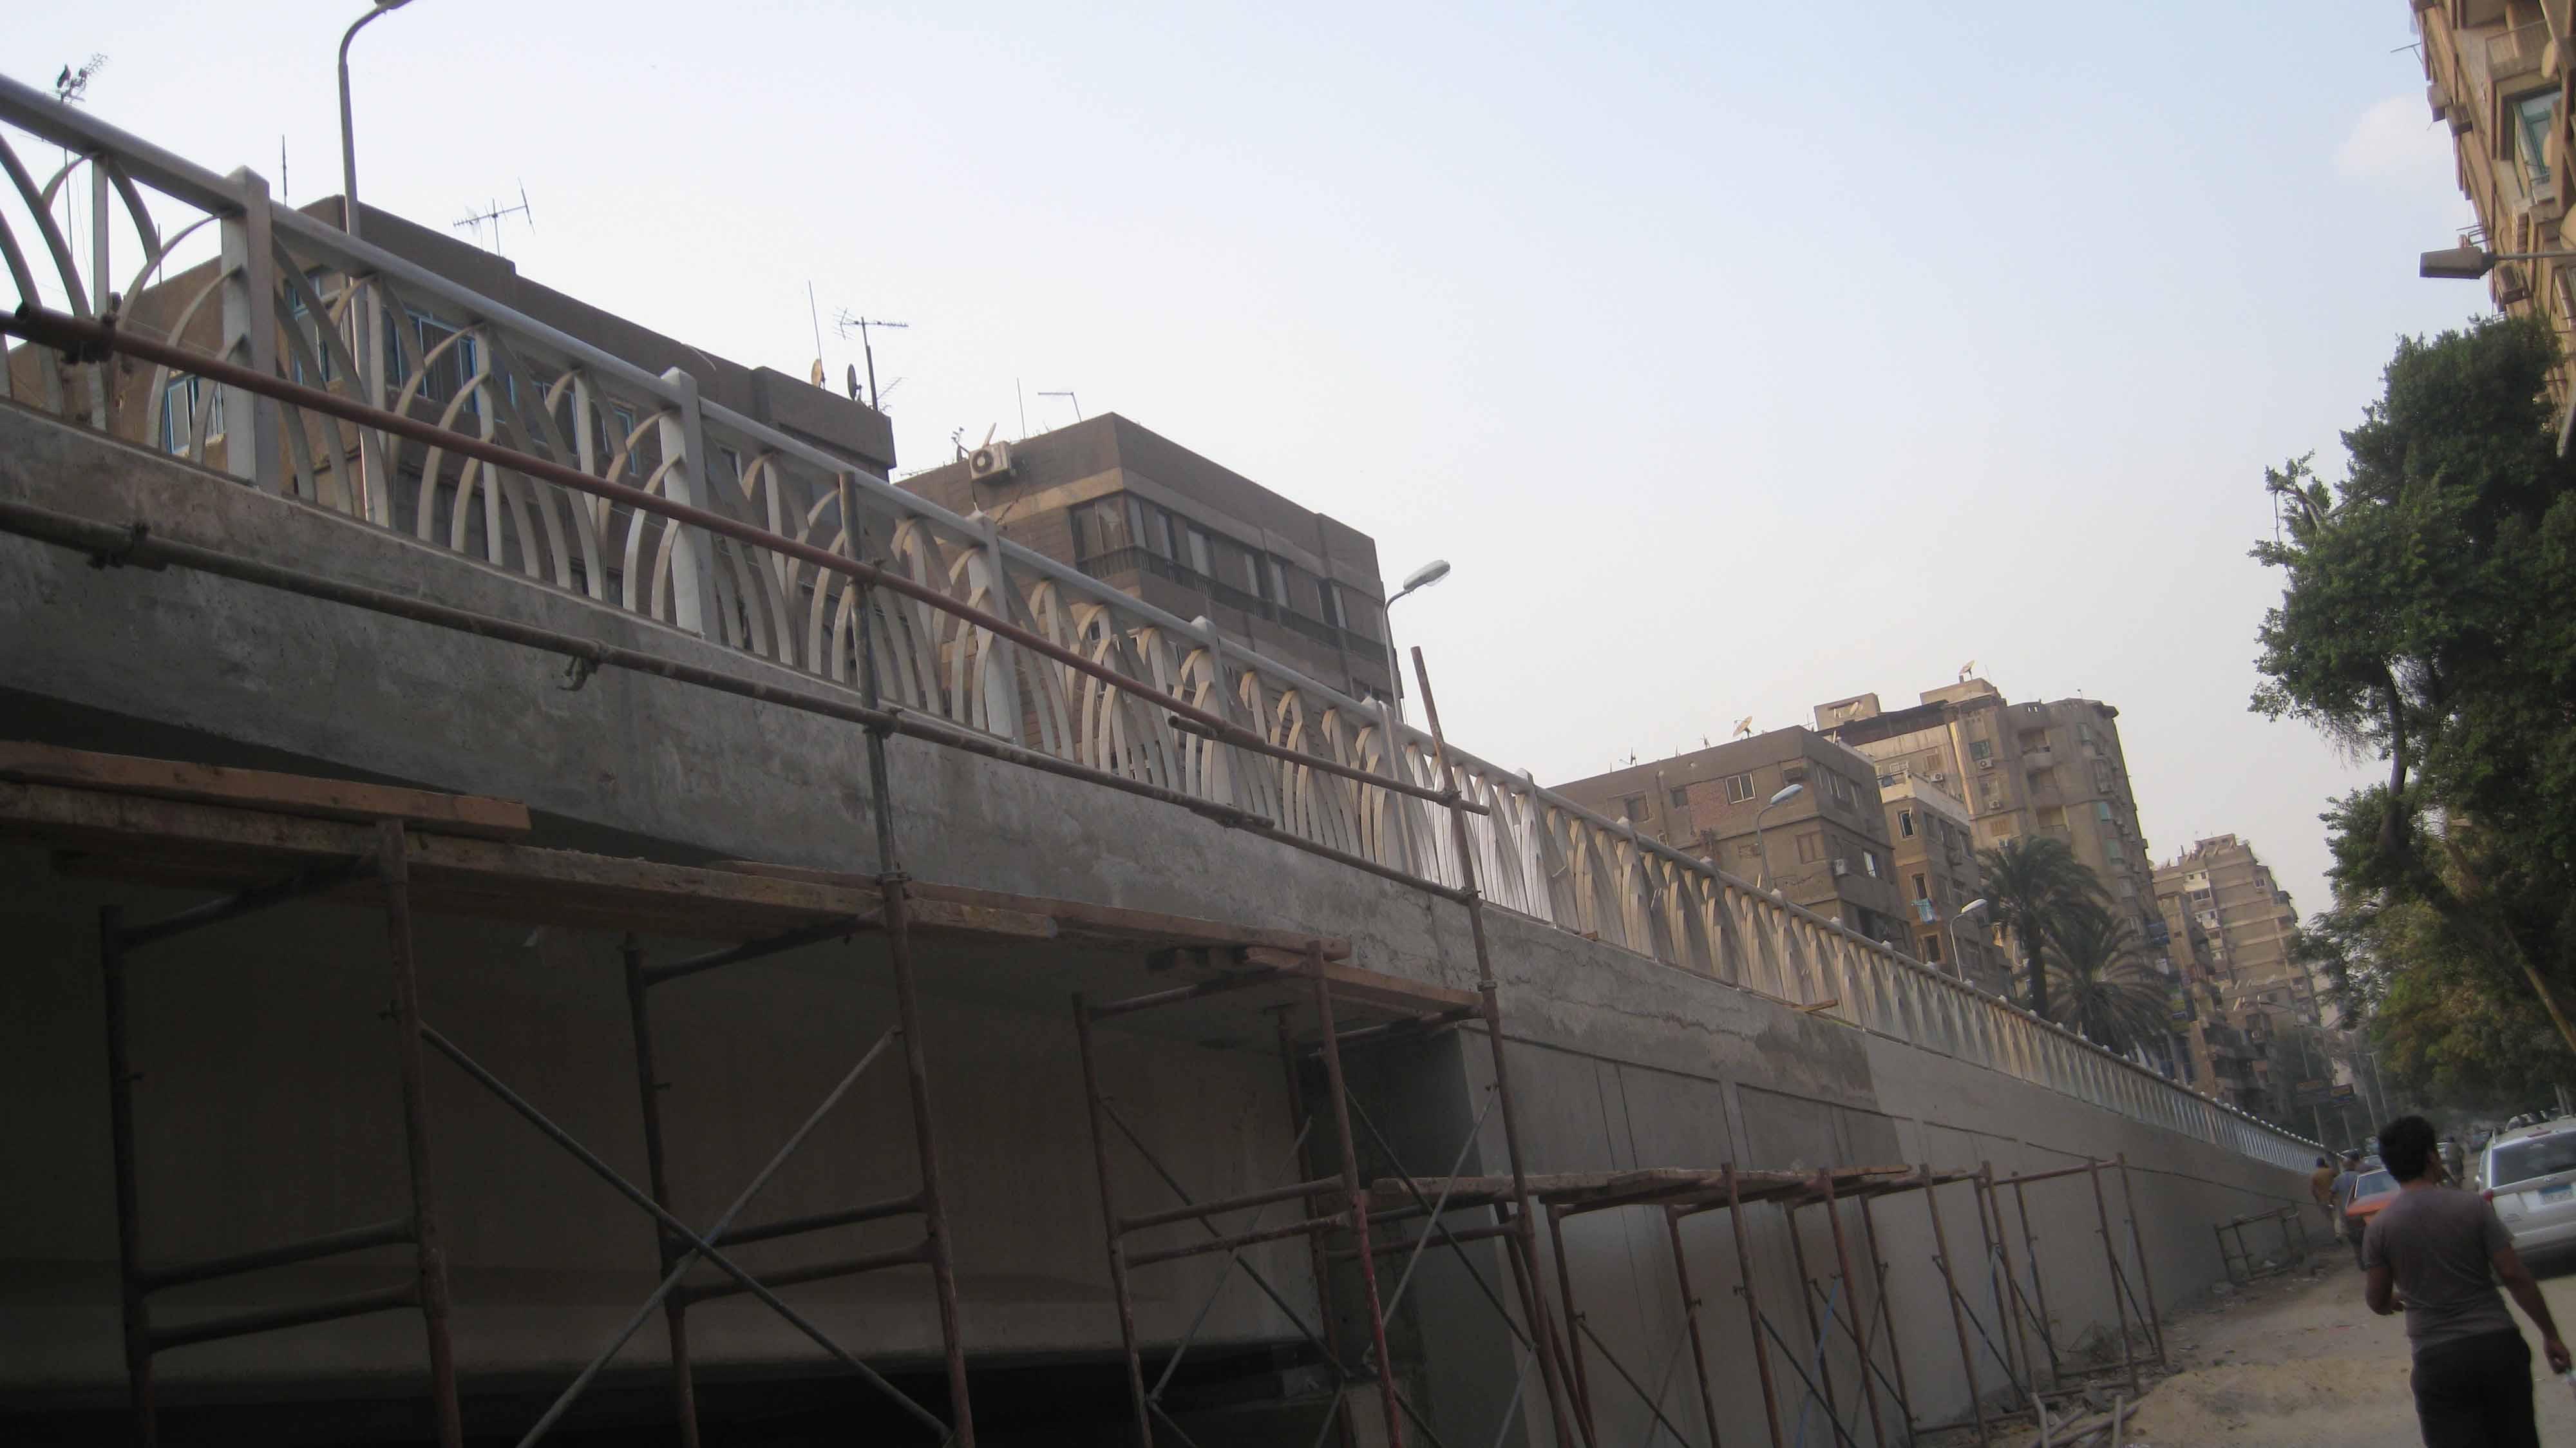 Ard Ellwaa Bridge (1]8)